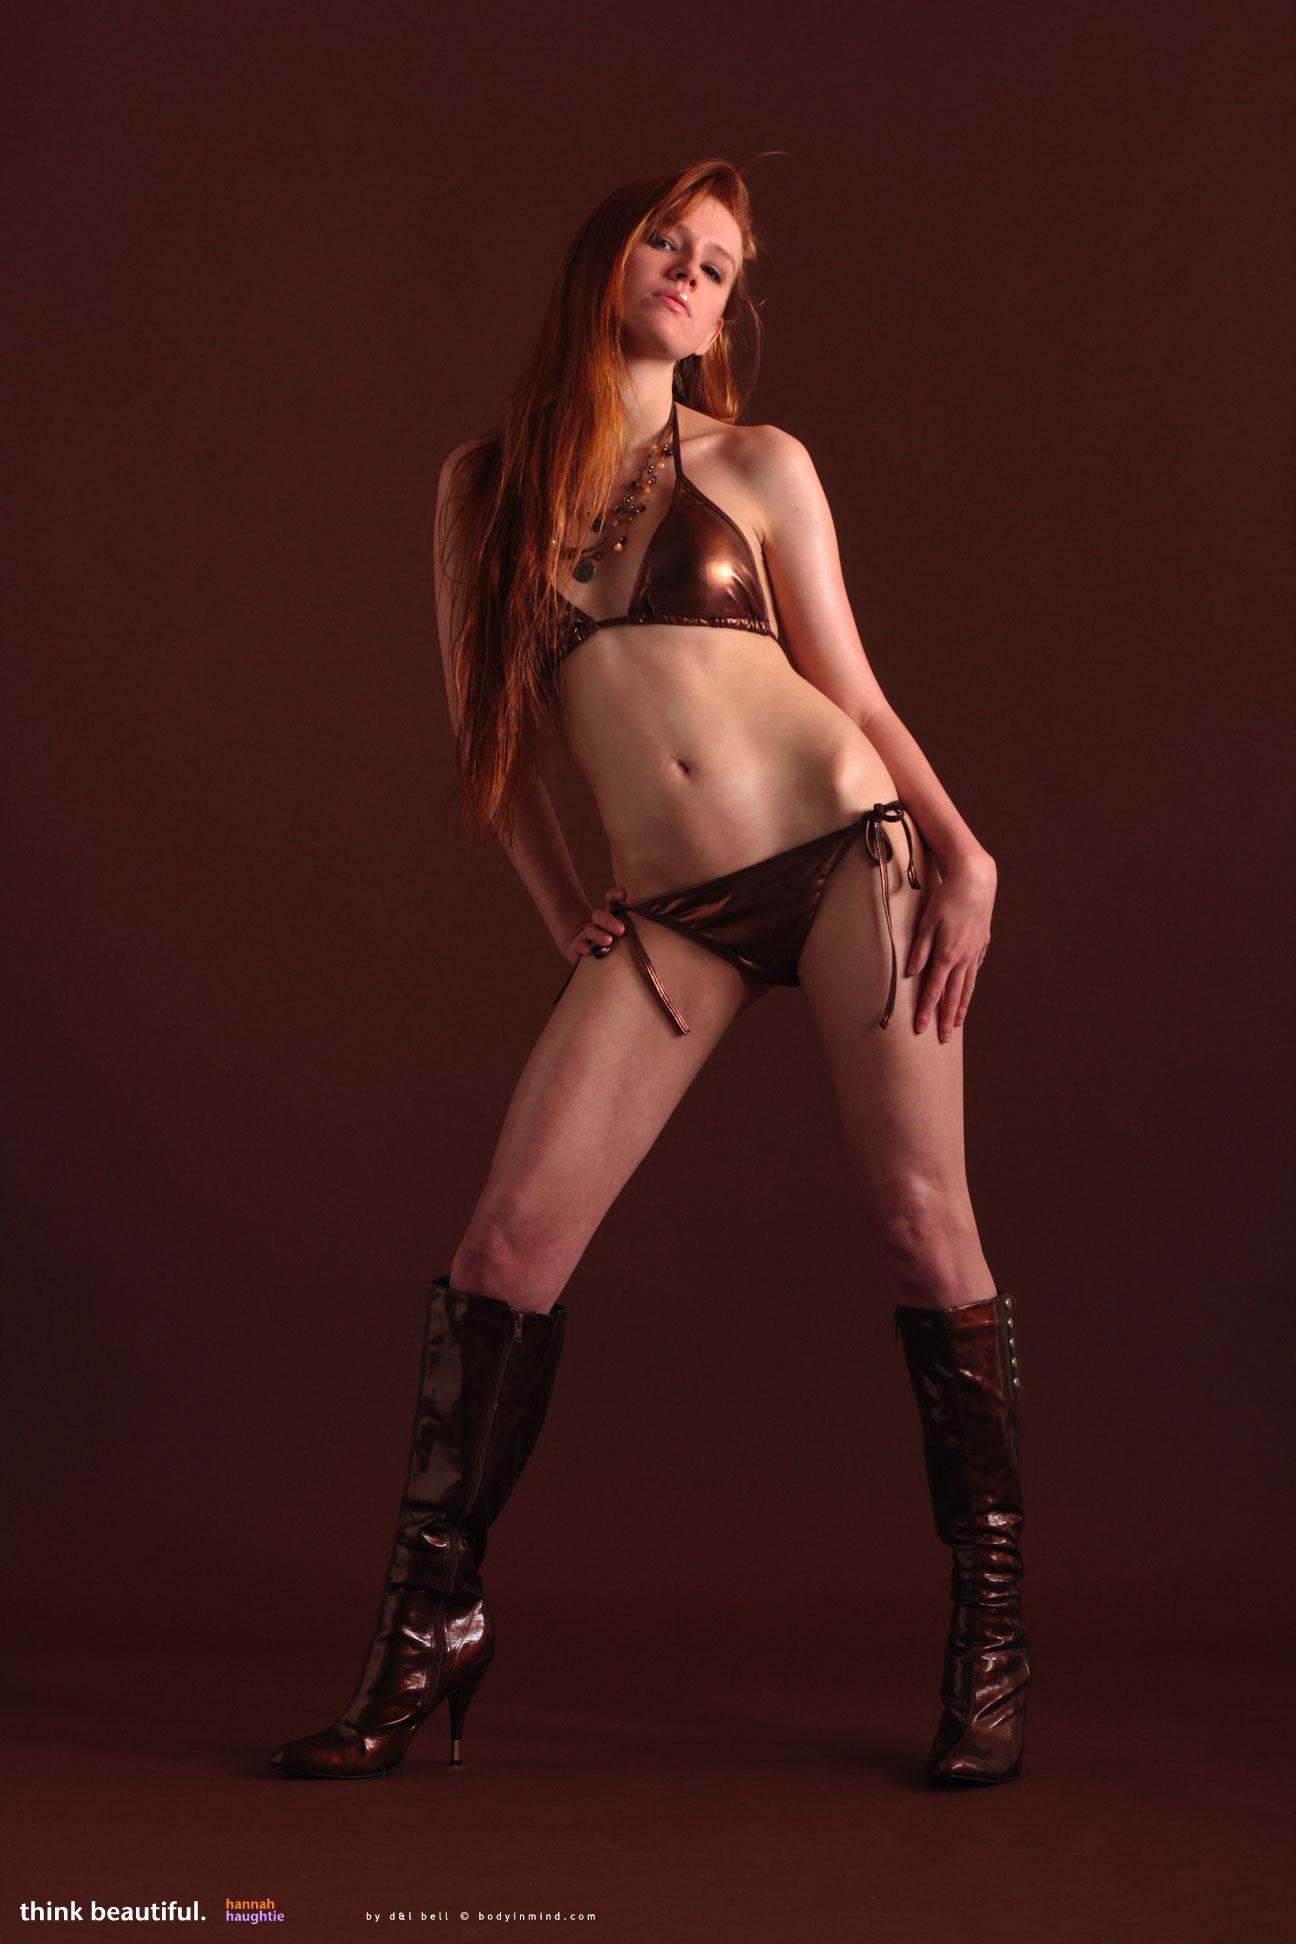 hannah-long-hair-redhead-naked-young-bodyinmind-01